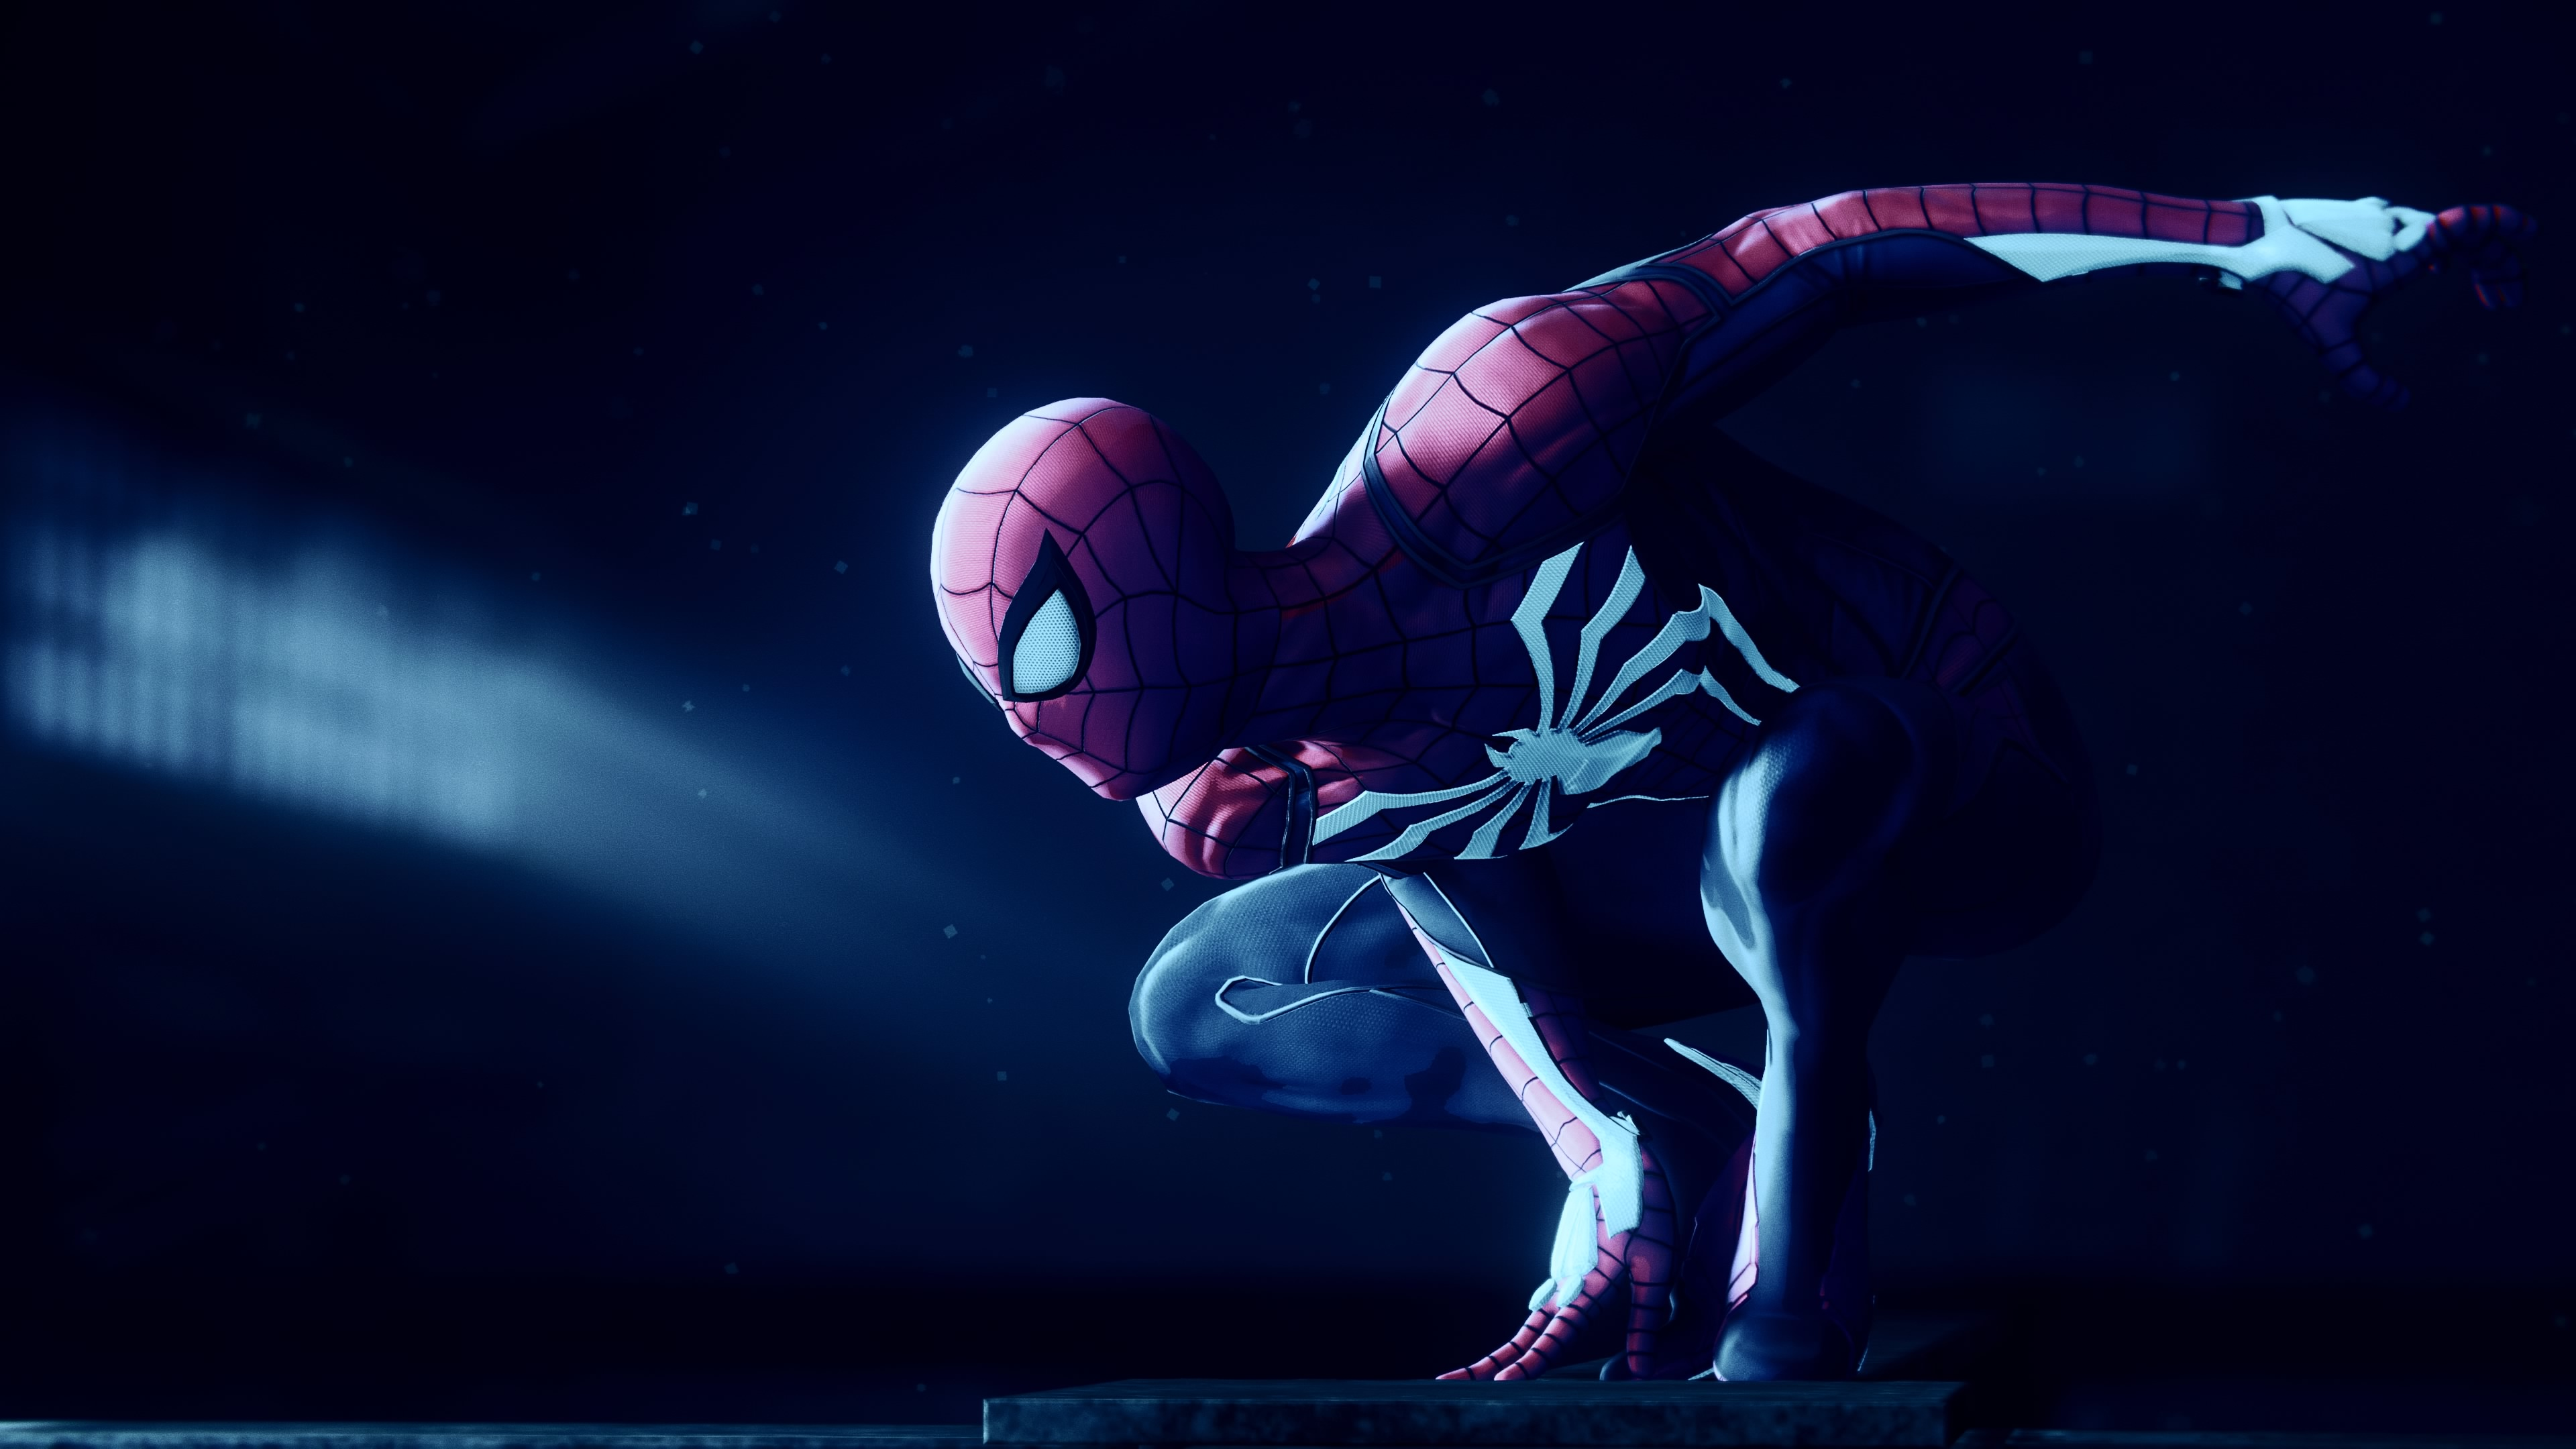 marvel spiderman game 4k 1553074988 - Marvel Spiderman Game 4k - superheroes wallpapers, spiderman wallpapers, spiderman ps4 wallpapers, ps games wallpapers, hd-wallpapers, games wallpapers, 4k-wallpapers, 2019 games wallpapers